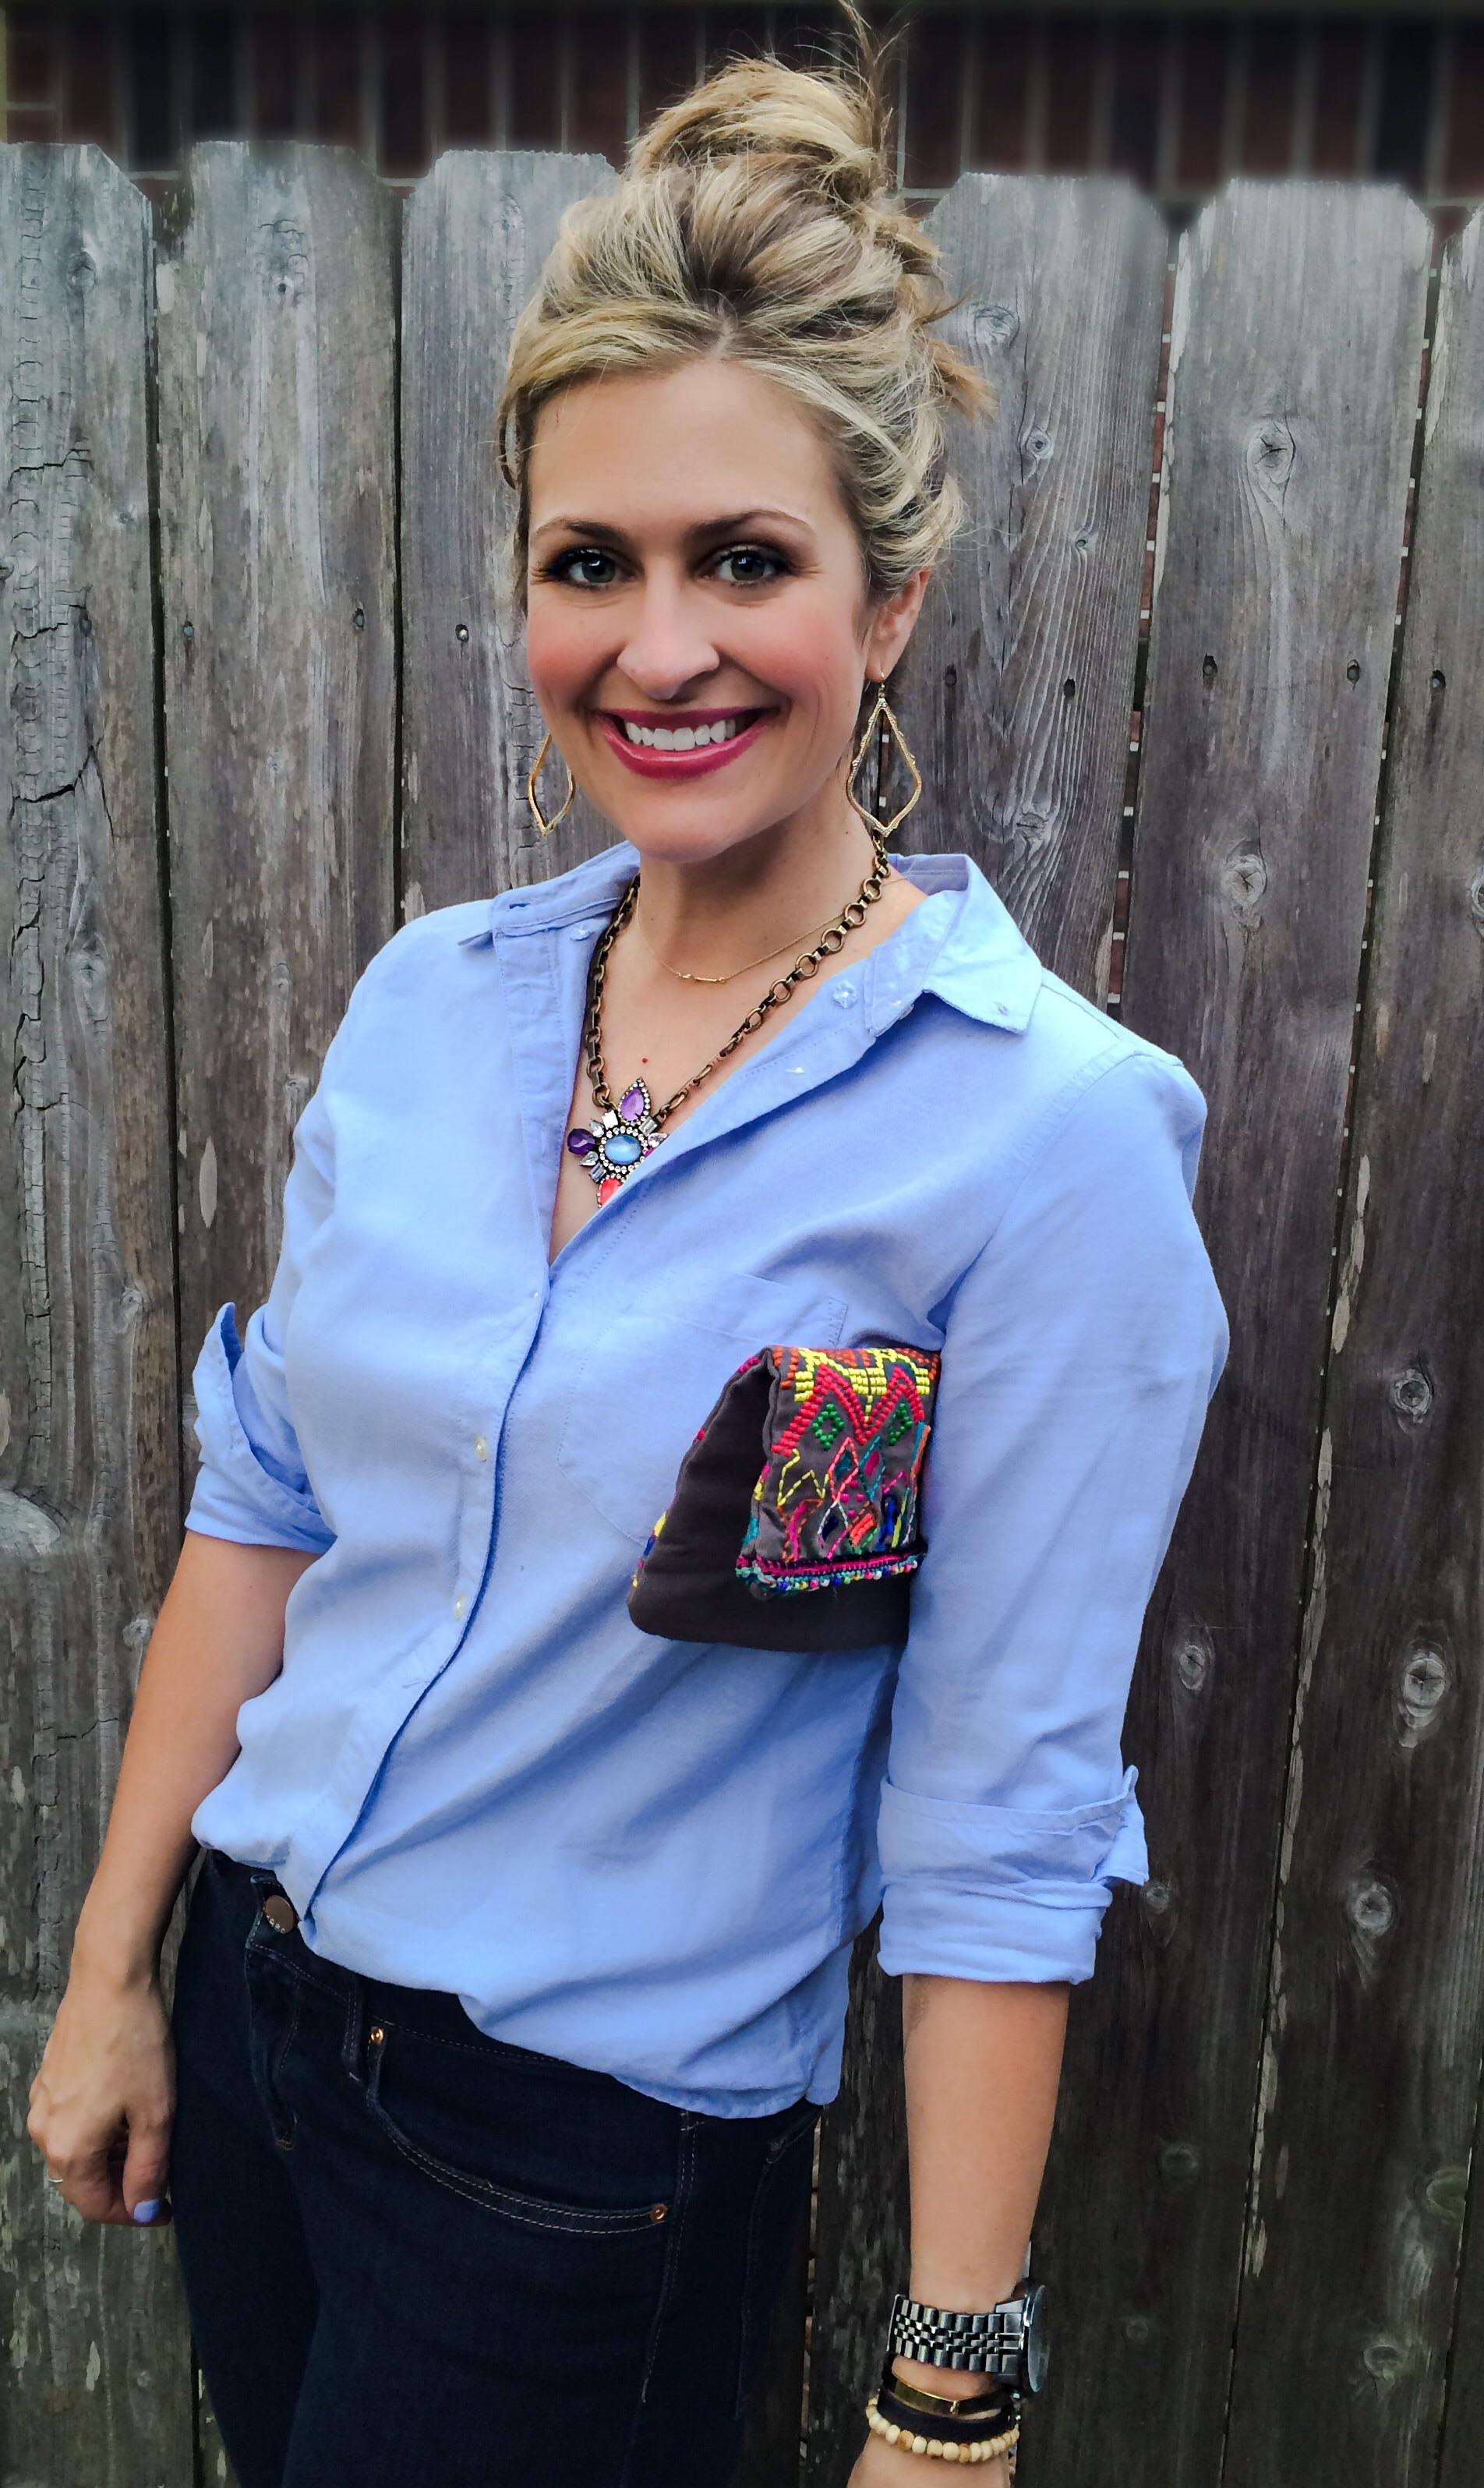 Necklace: Loren Hope (similar here ) Jeans: Gap Always Skinny  Shirt: Gap Oxford    Earrings: Kendra Scott  Clutch:  Star Mela